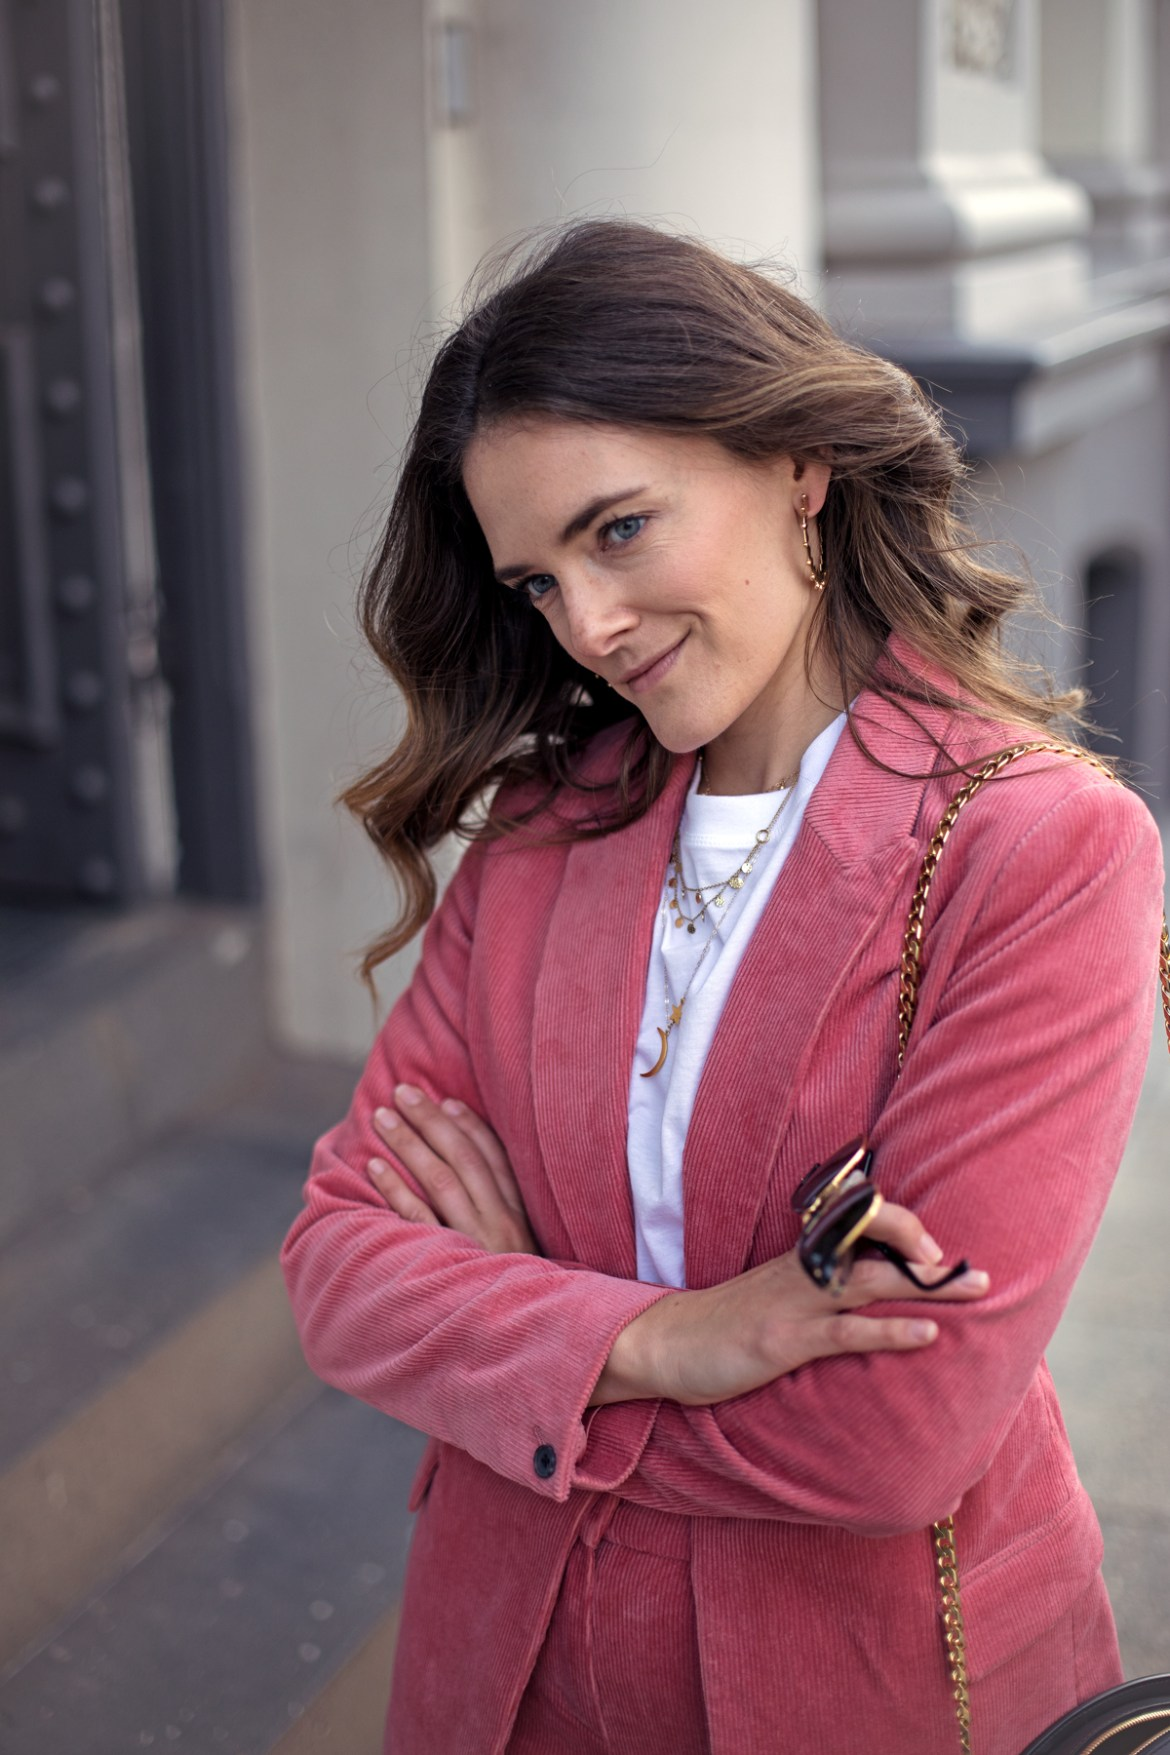 Boden Oxshott corduroy blazer in blush pink worn by fashion blogger from Australia Jenelle Witty of Inspiring Wit